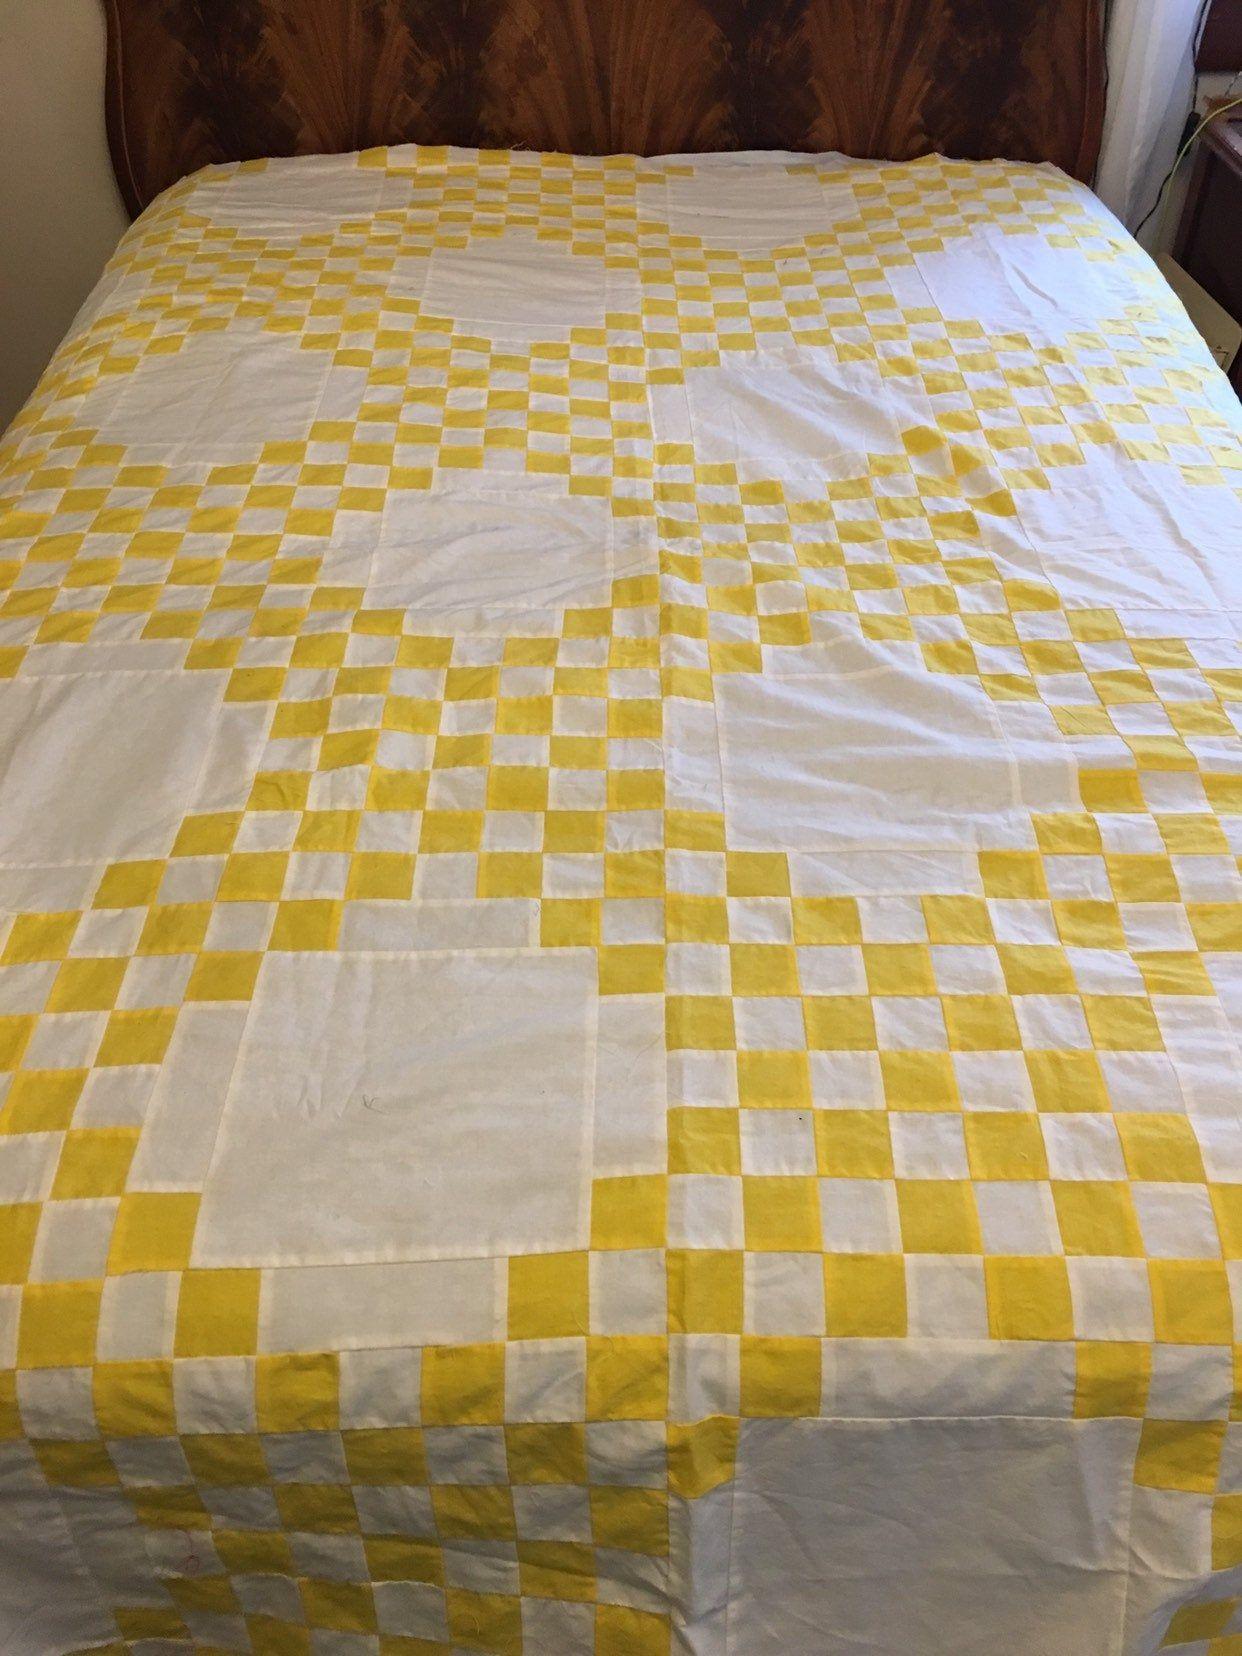 Vintage Yellow Irish Chain Quilt Top Striking Quilttop Bedspread Quilt Yellow Irish Quilts Chain White Vintage Irish Chain Quilt Quilt Top Quilts